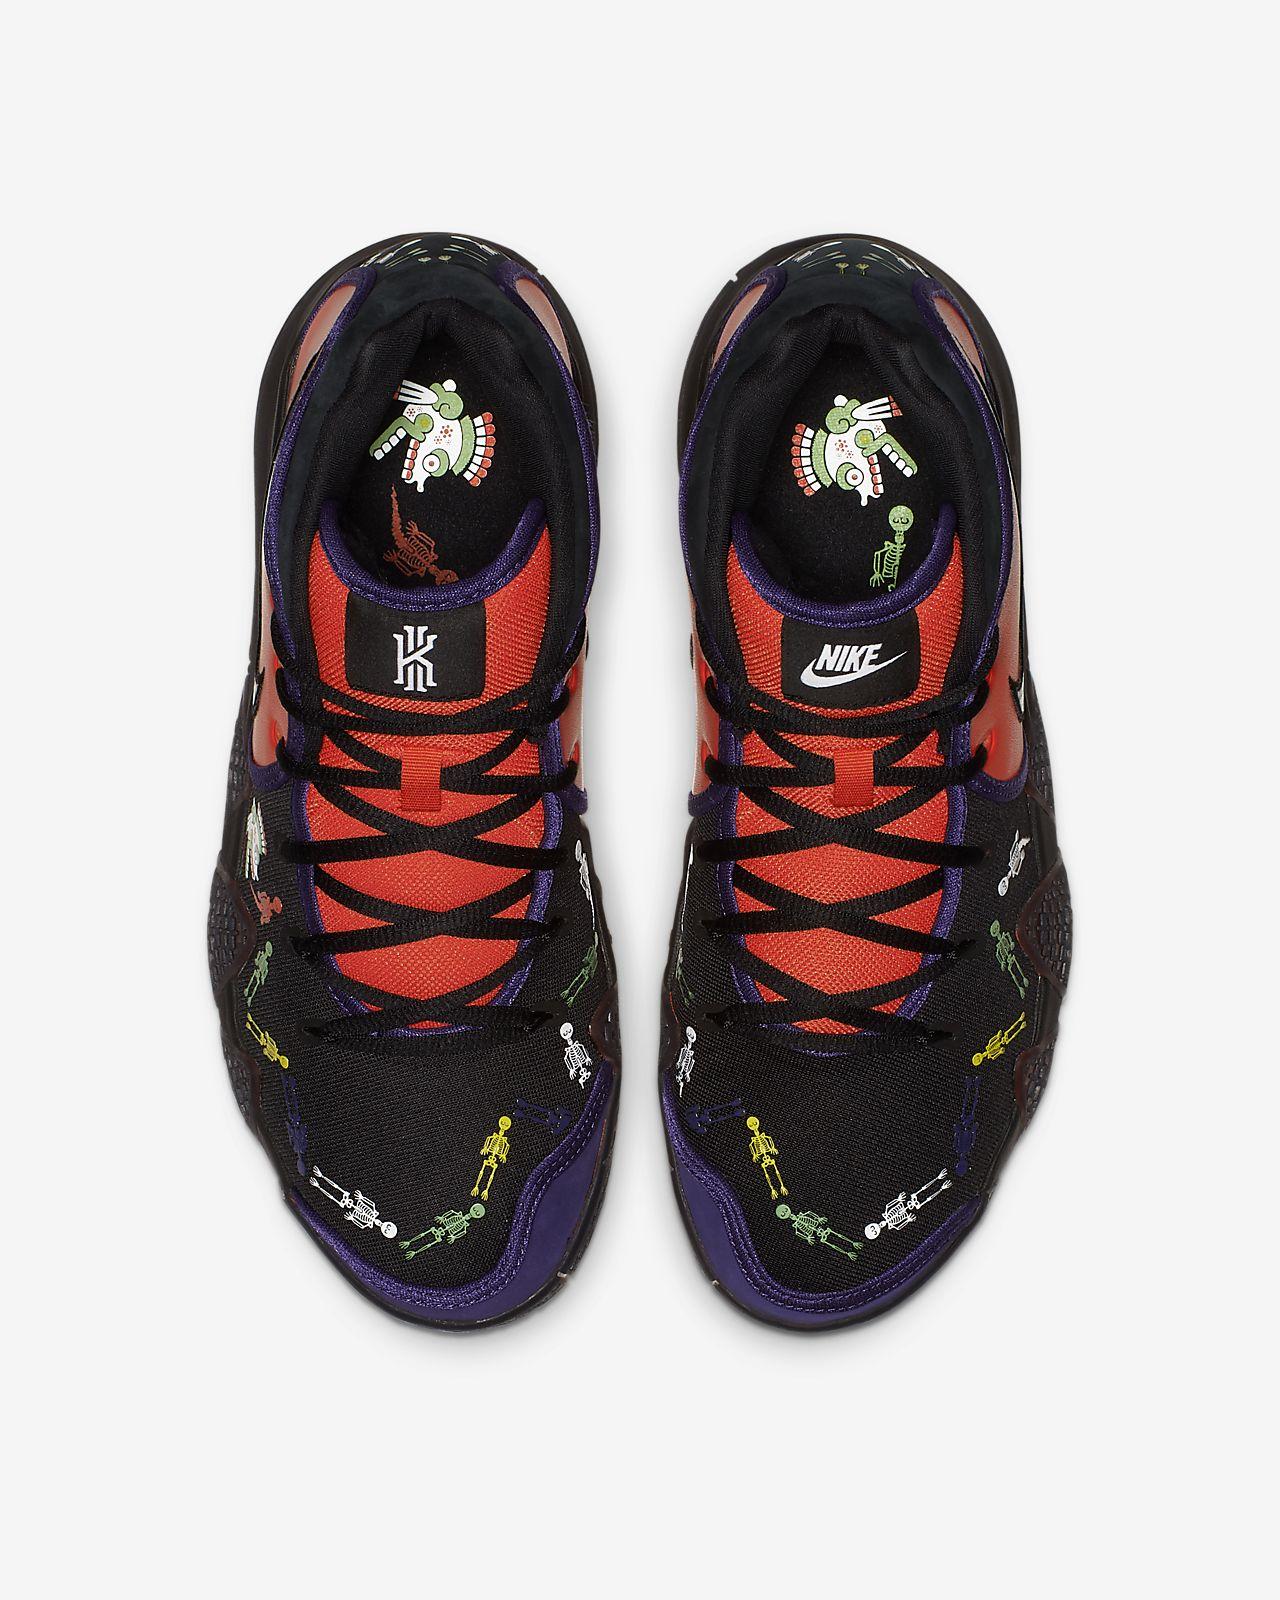 the latest e5e27 70ecc ... Kyrie 4 Day of the Dead Basketball Shoe